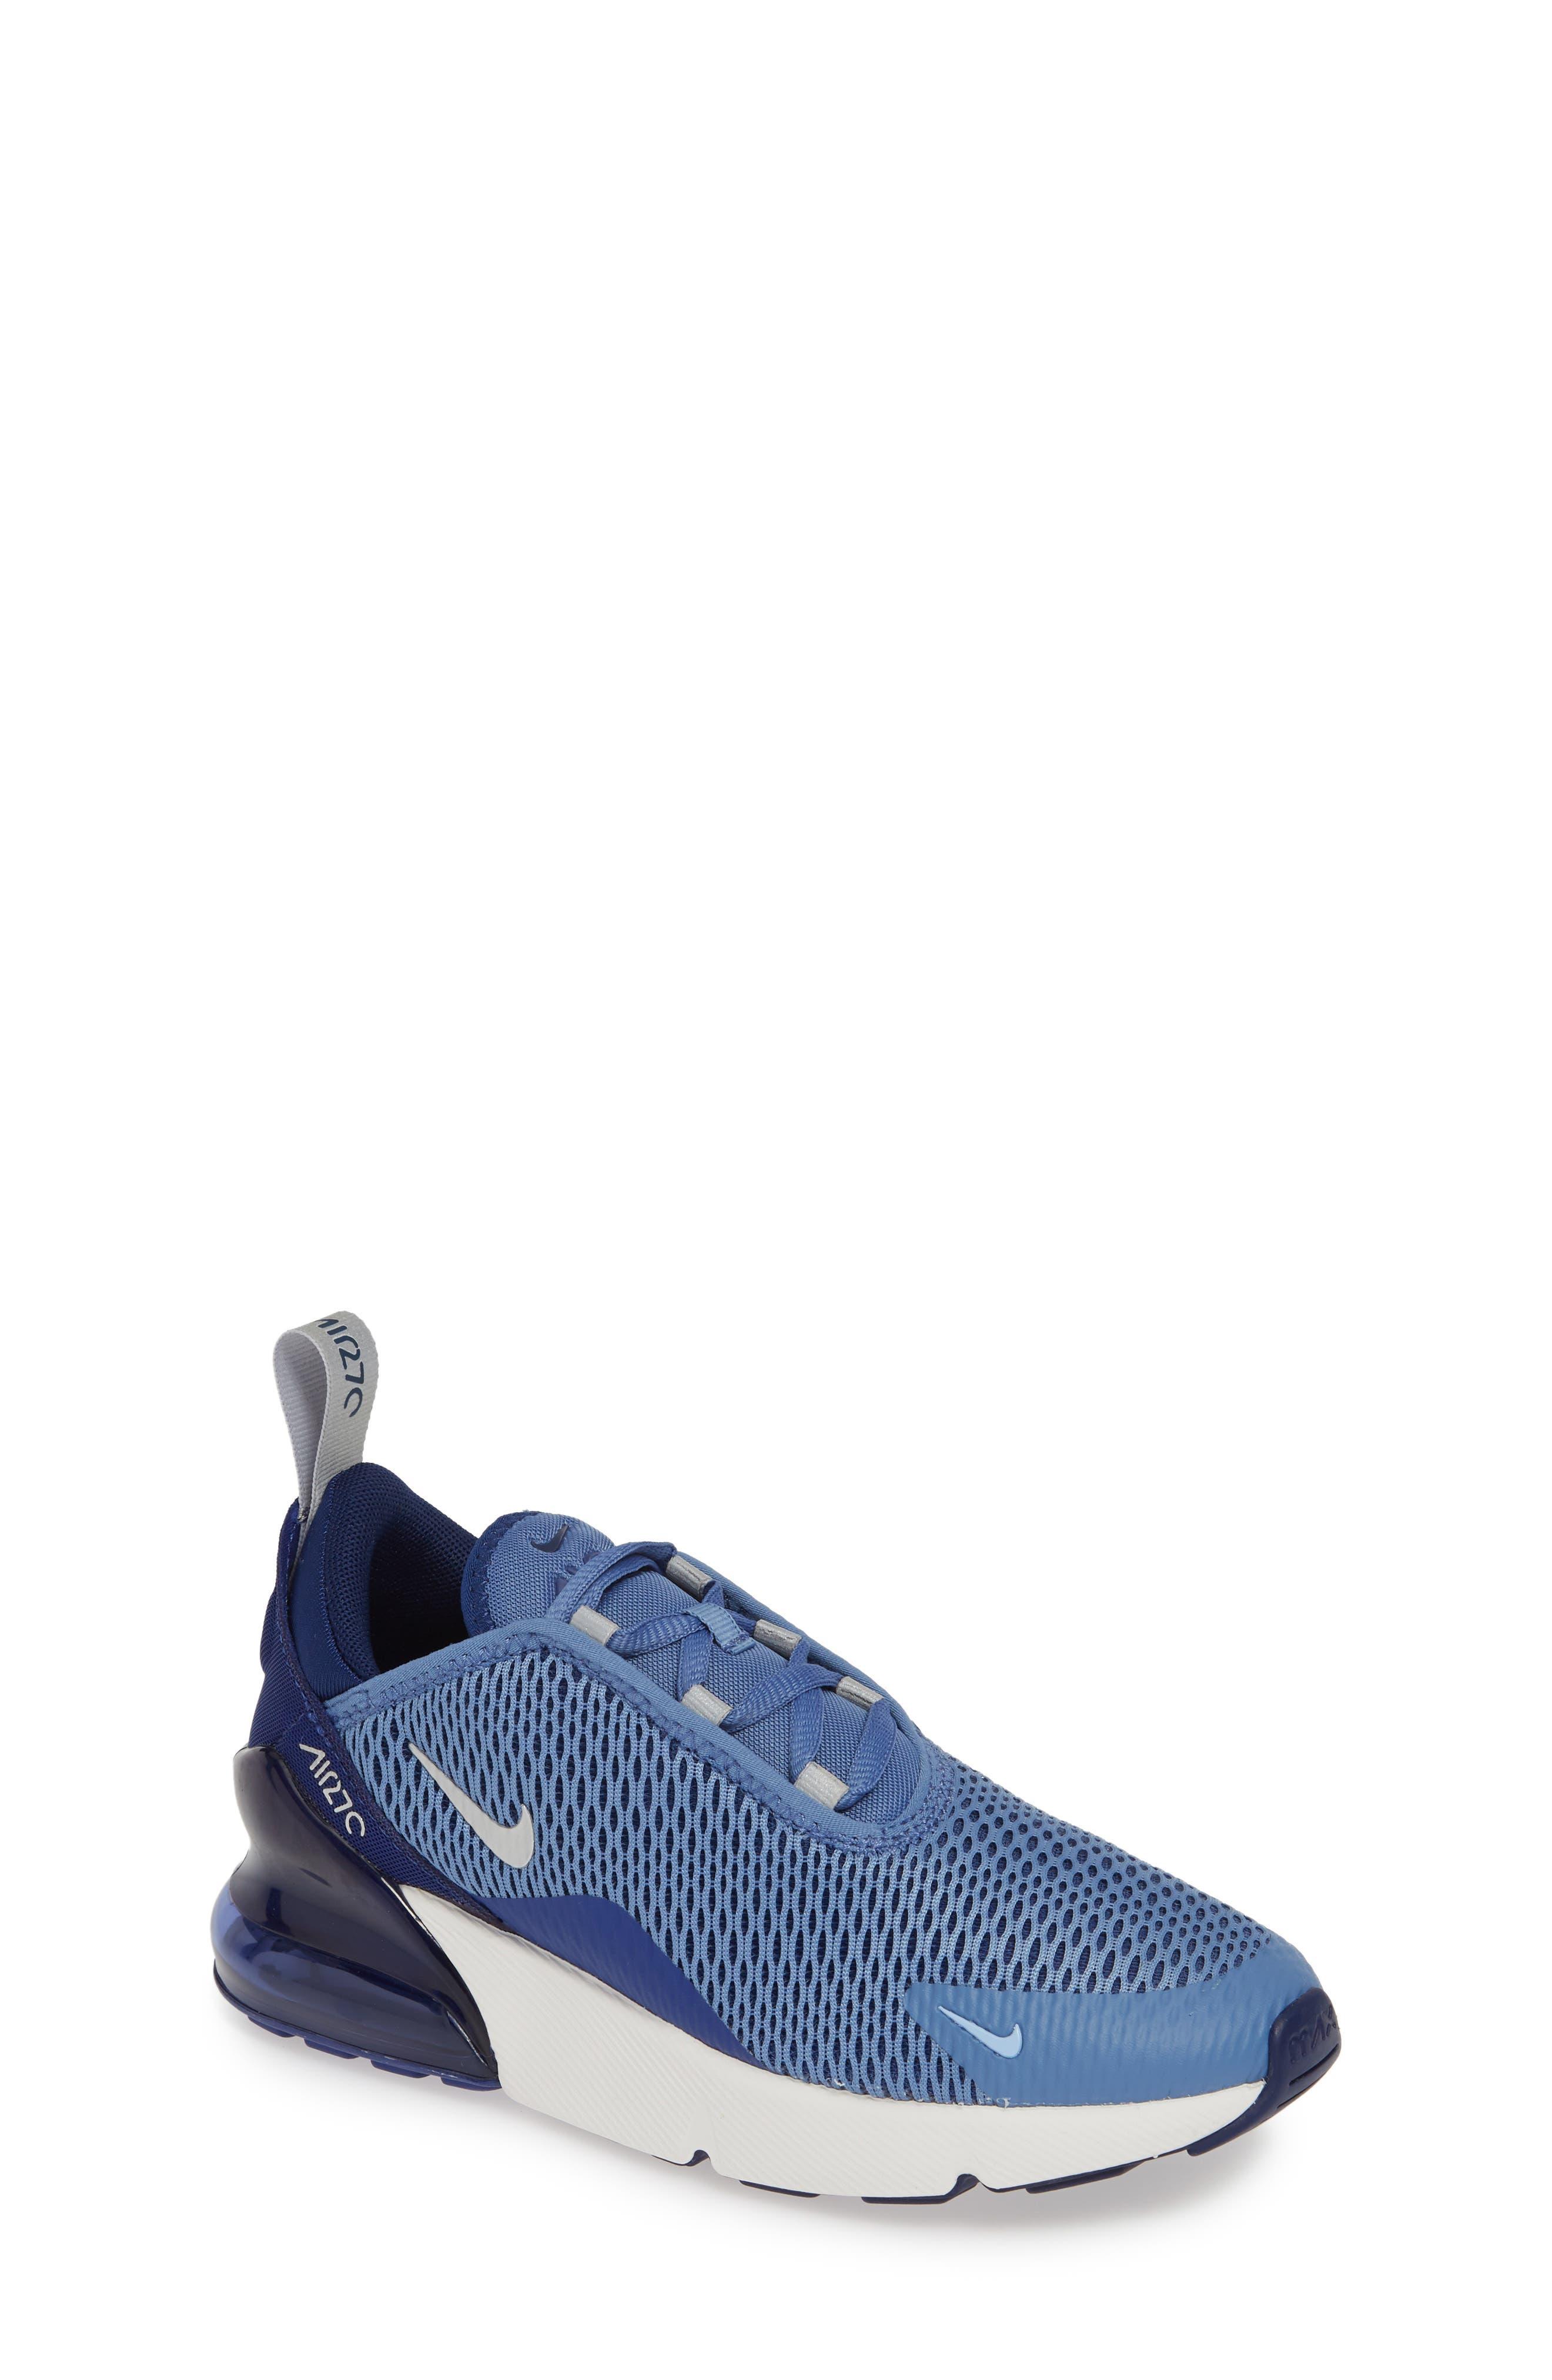 Air Max 270 Sneaker, Main, color, INDIGO STORM/ METALLIC SILVER